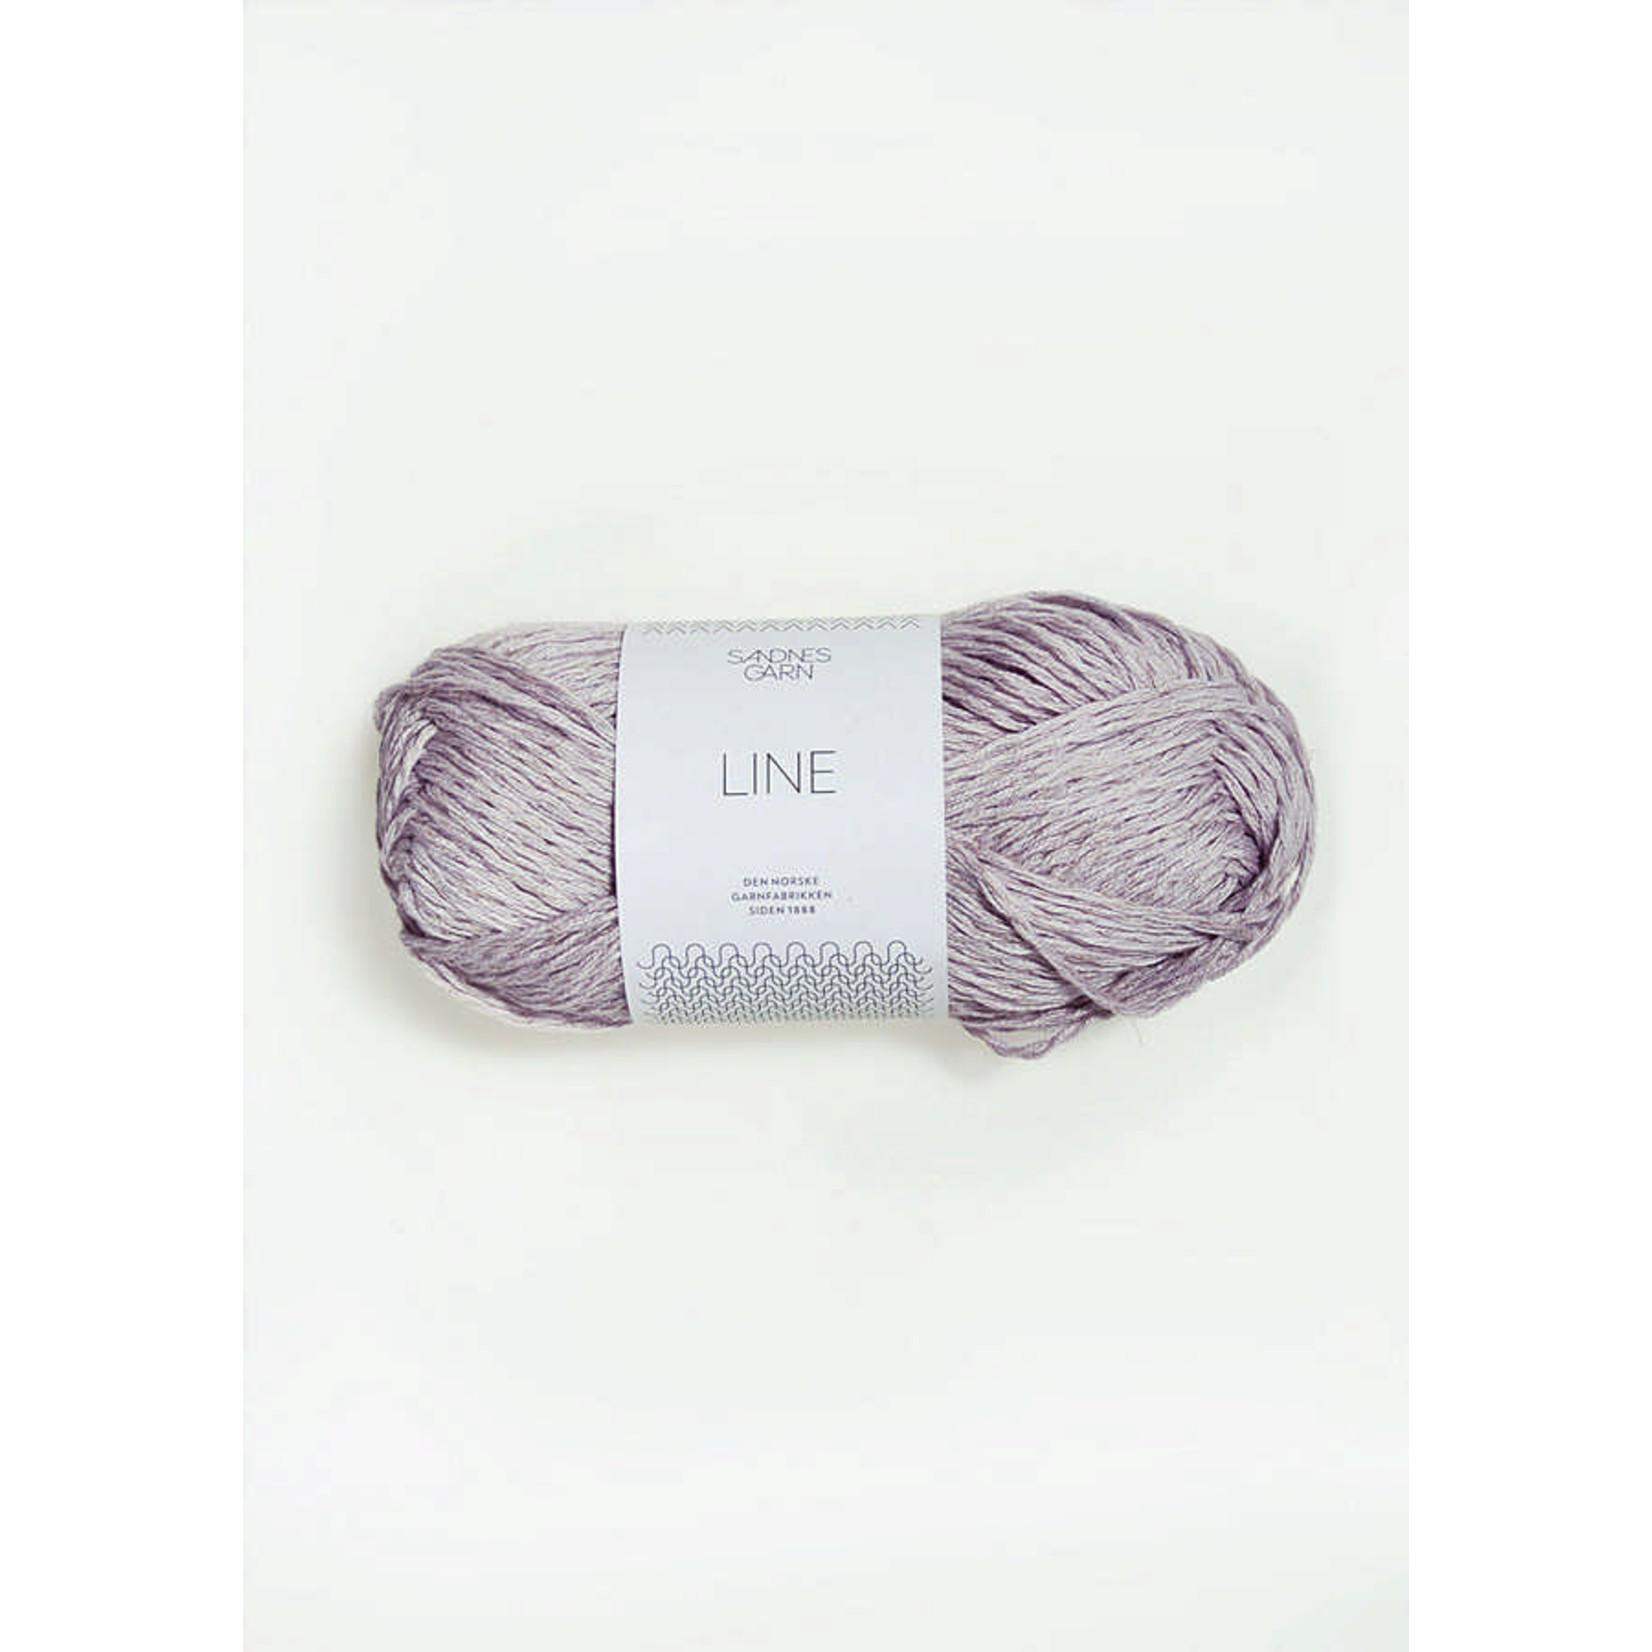 Sandnes Garn Line, 4620, Light Purple